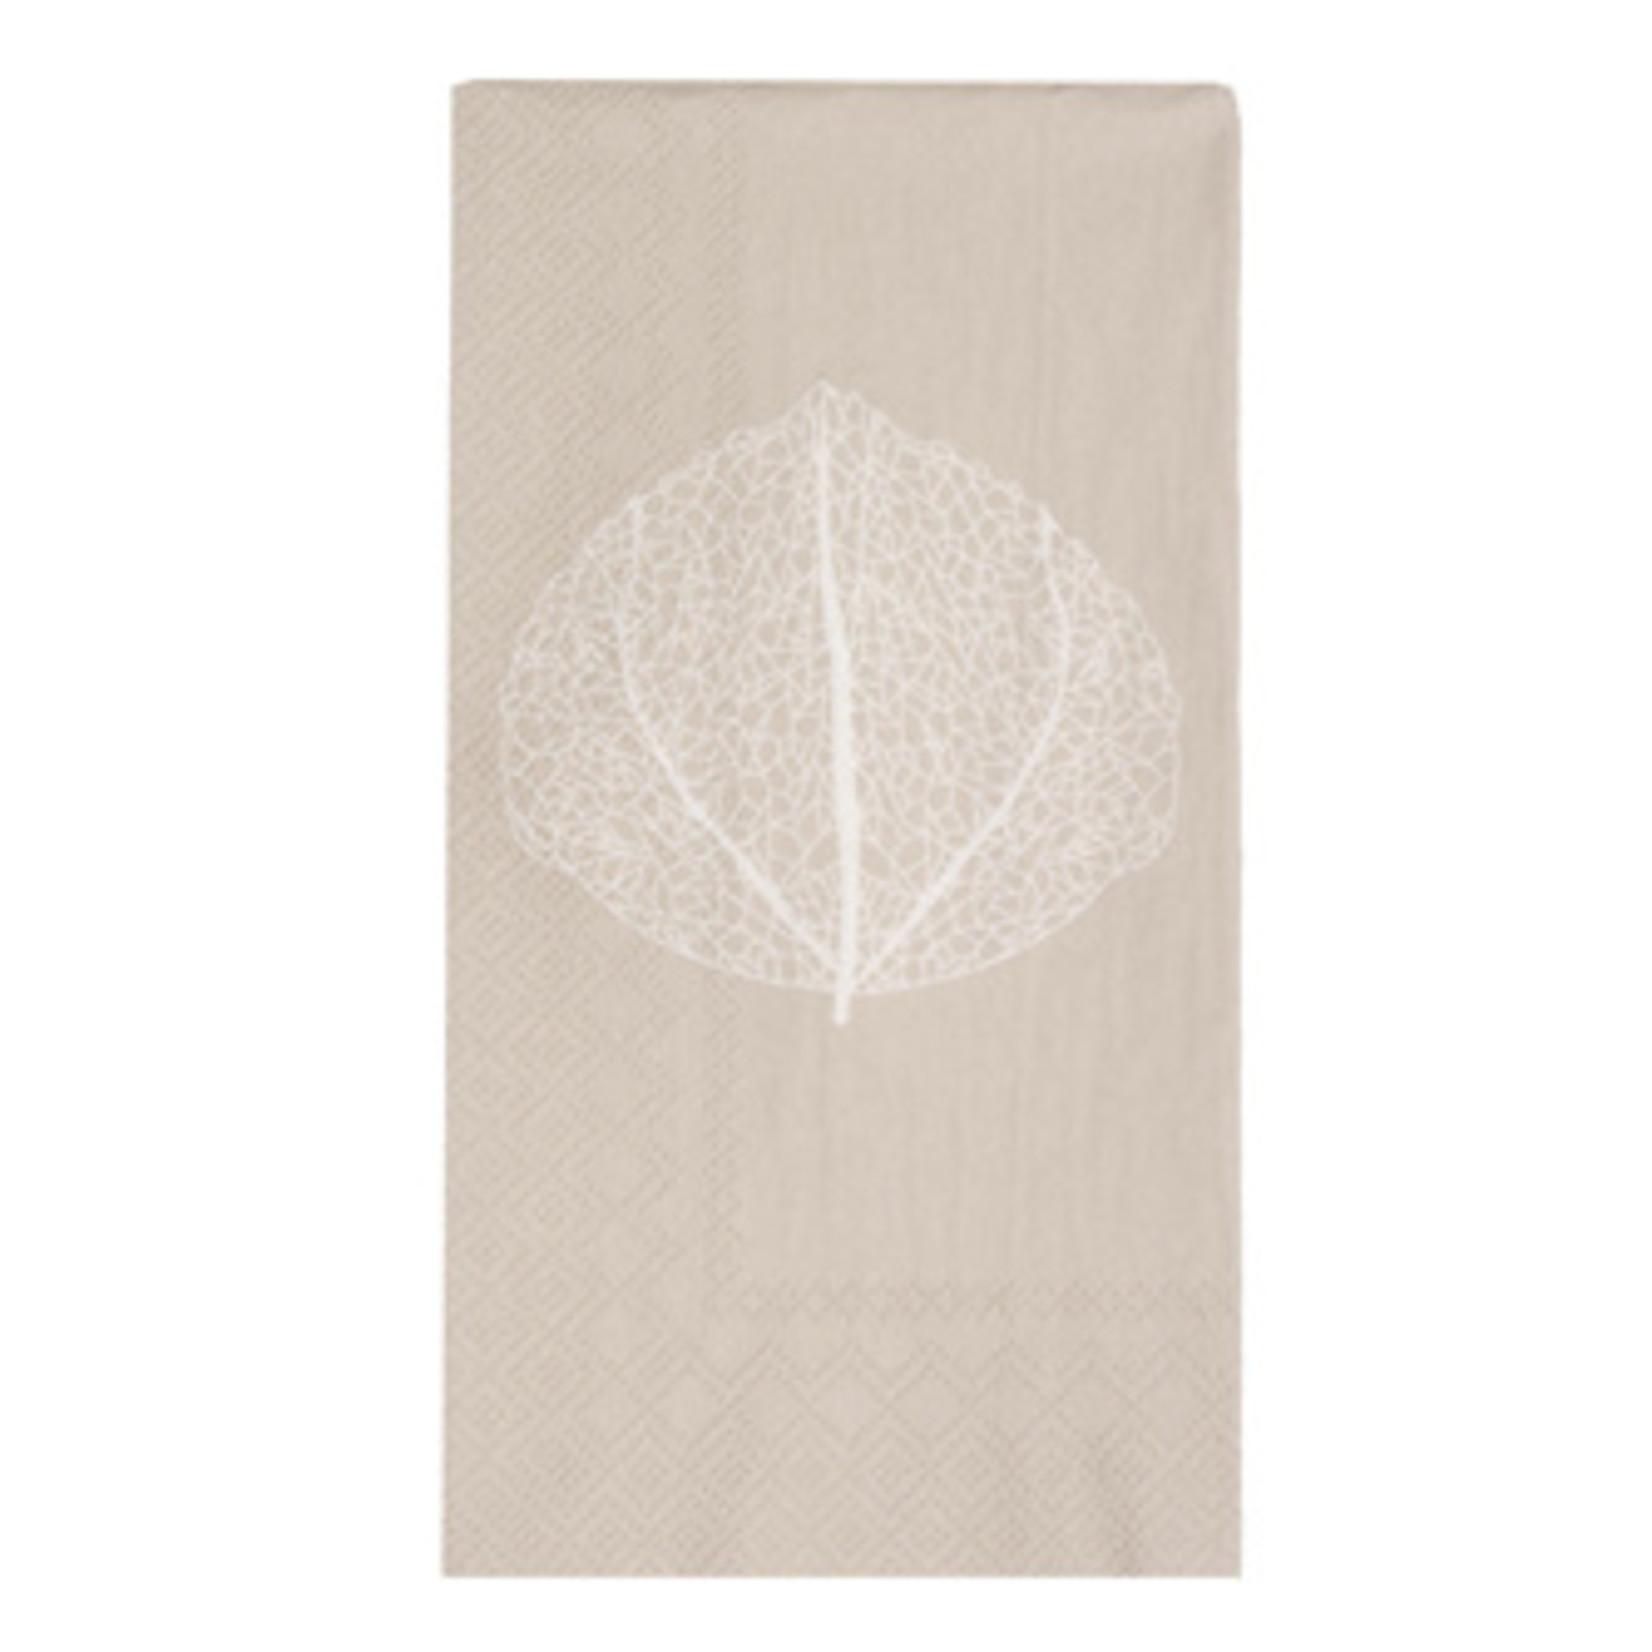 Storefactory  Serviette Bjuda beige leaf